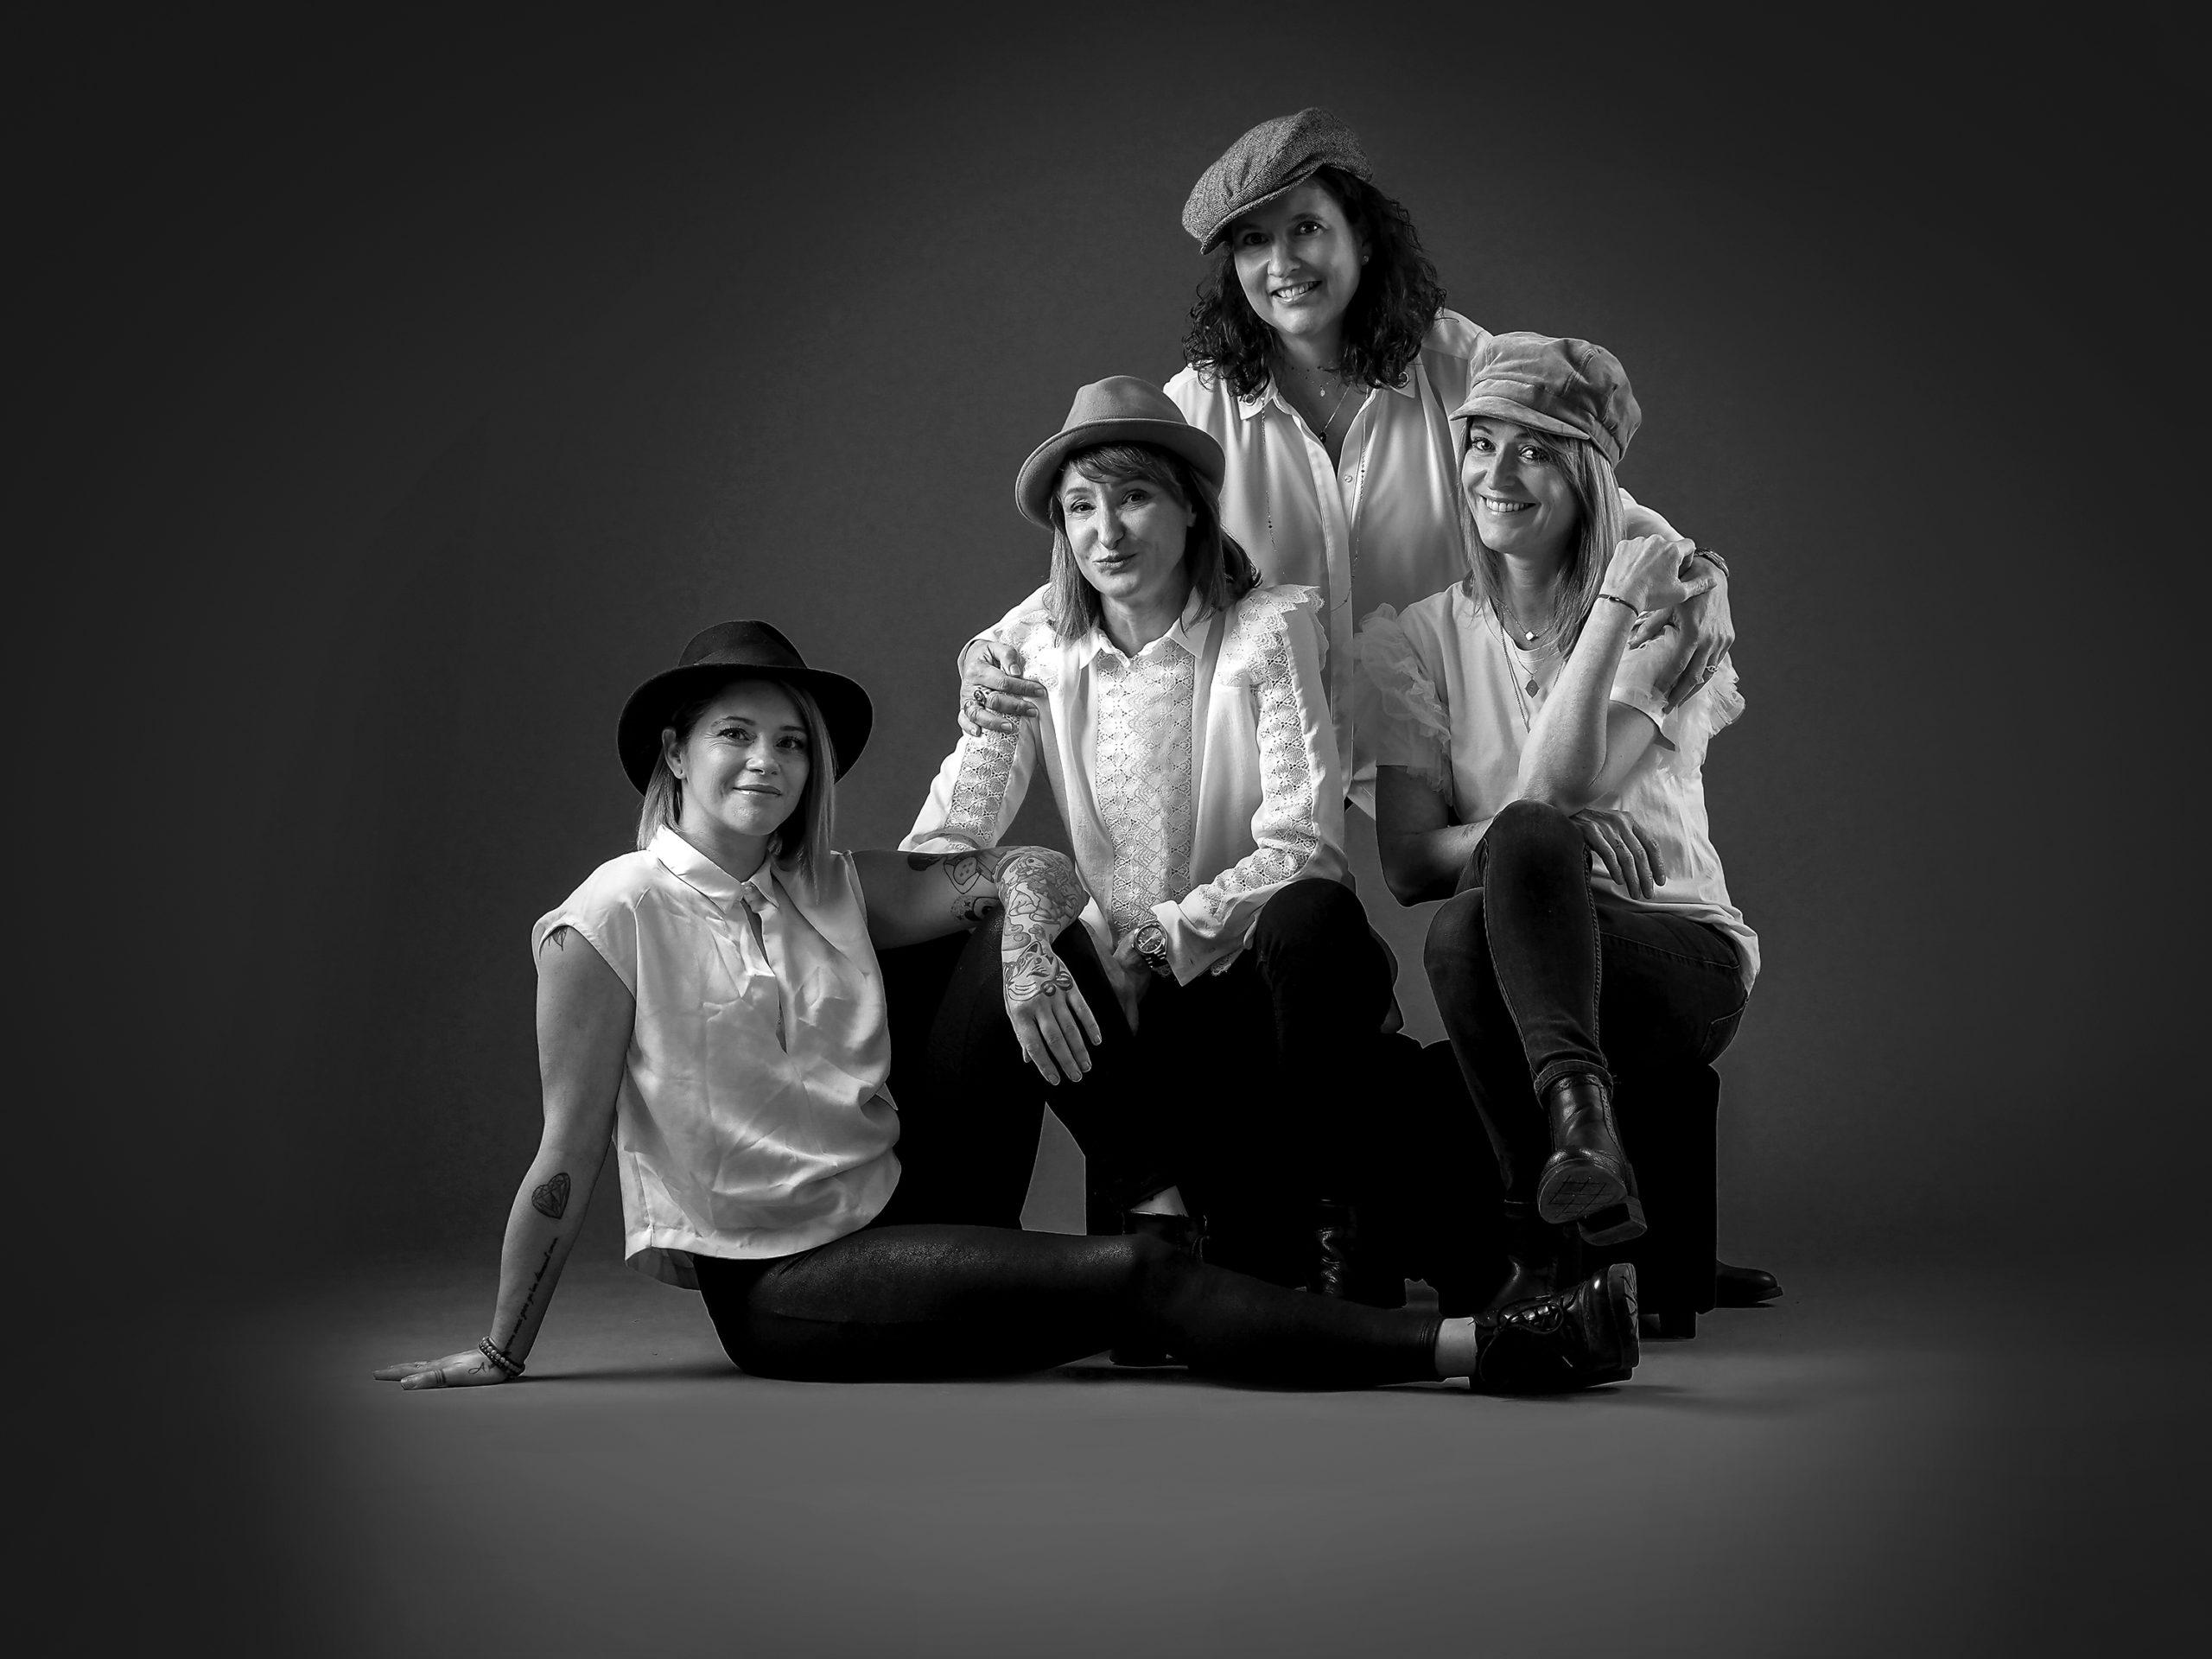 Sensivia-photographe-portraitiste-groupe-entre-amis